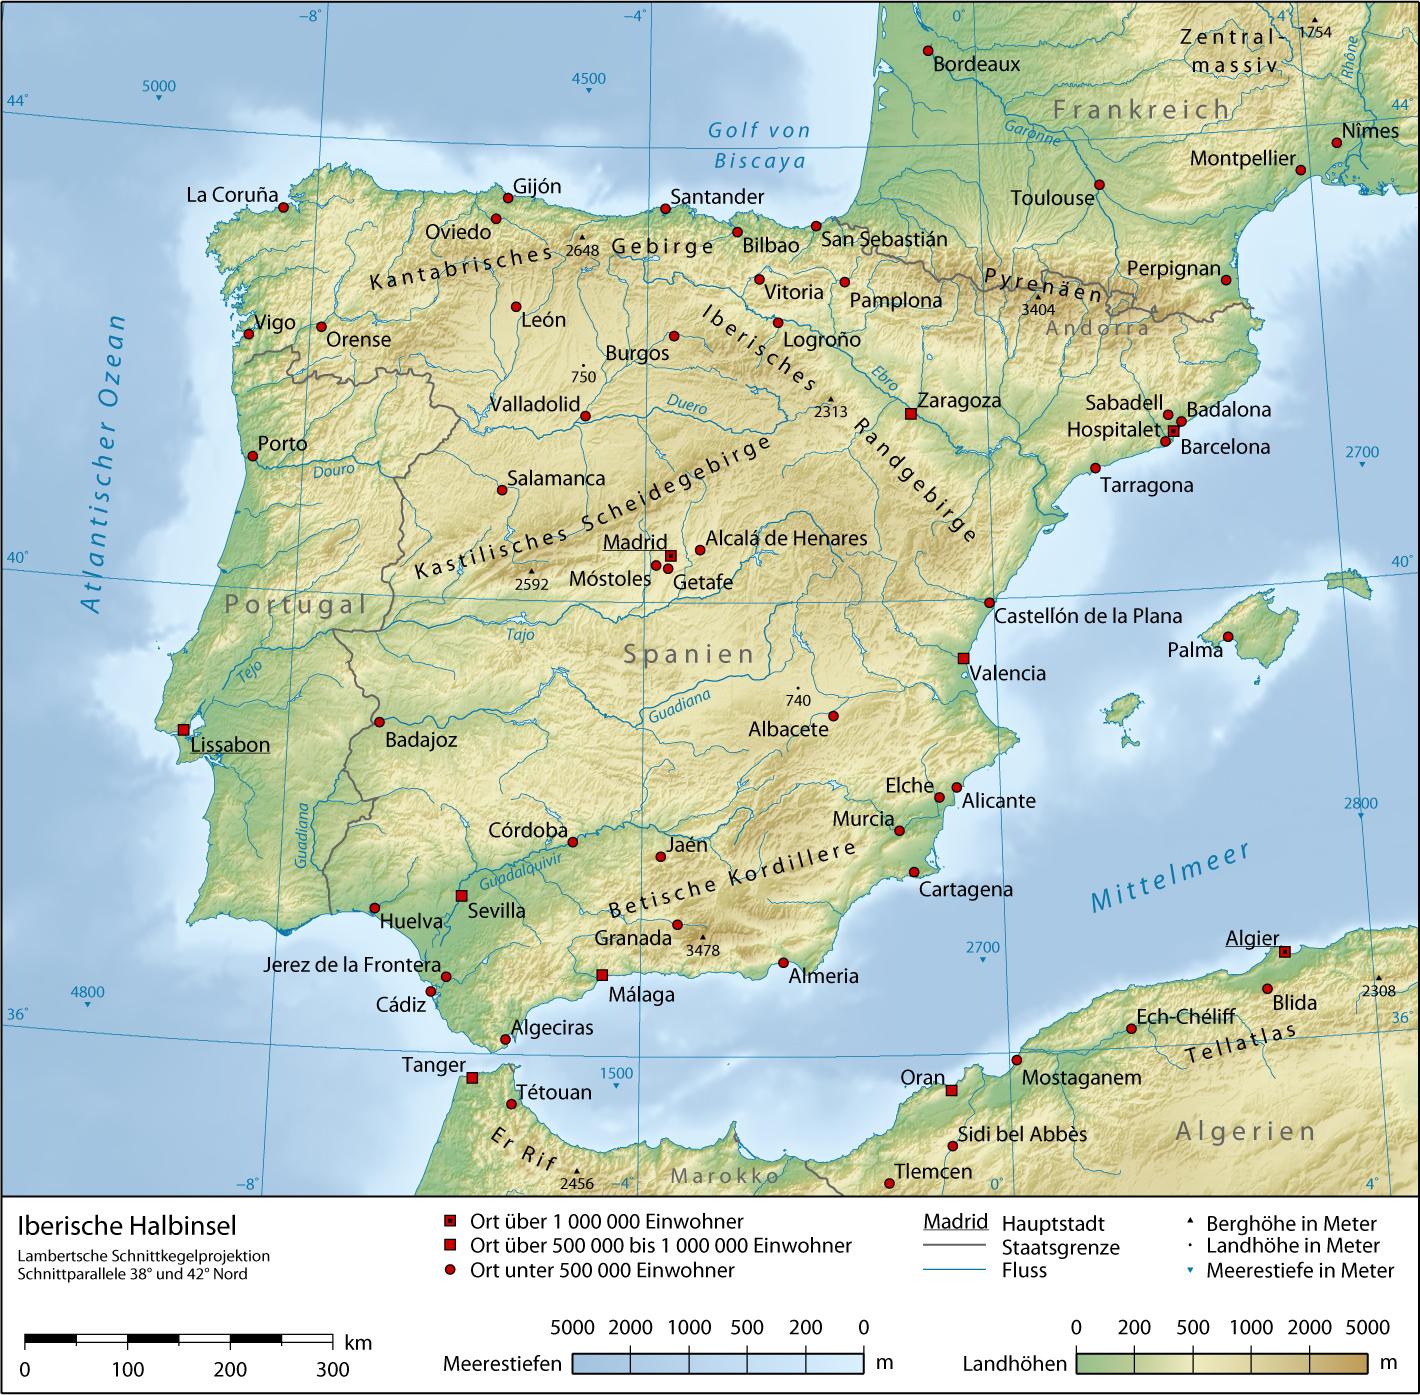 Map of Iberian Peninsula : Worldofmaps.net - online Maps and Travel ...